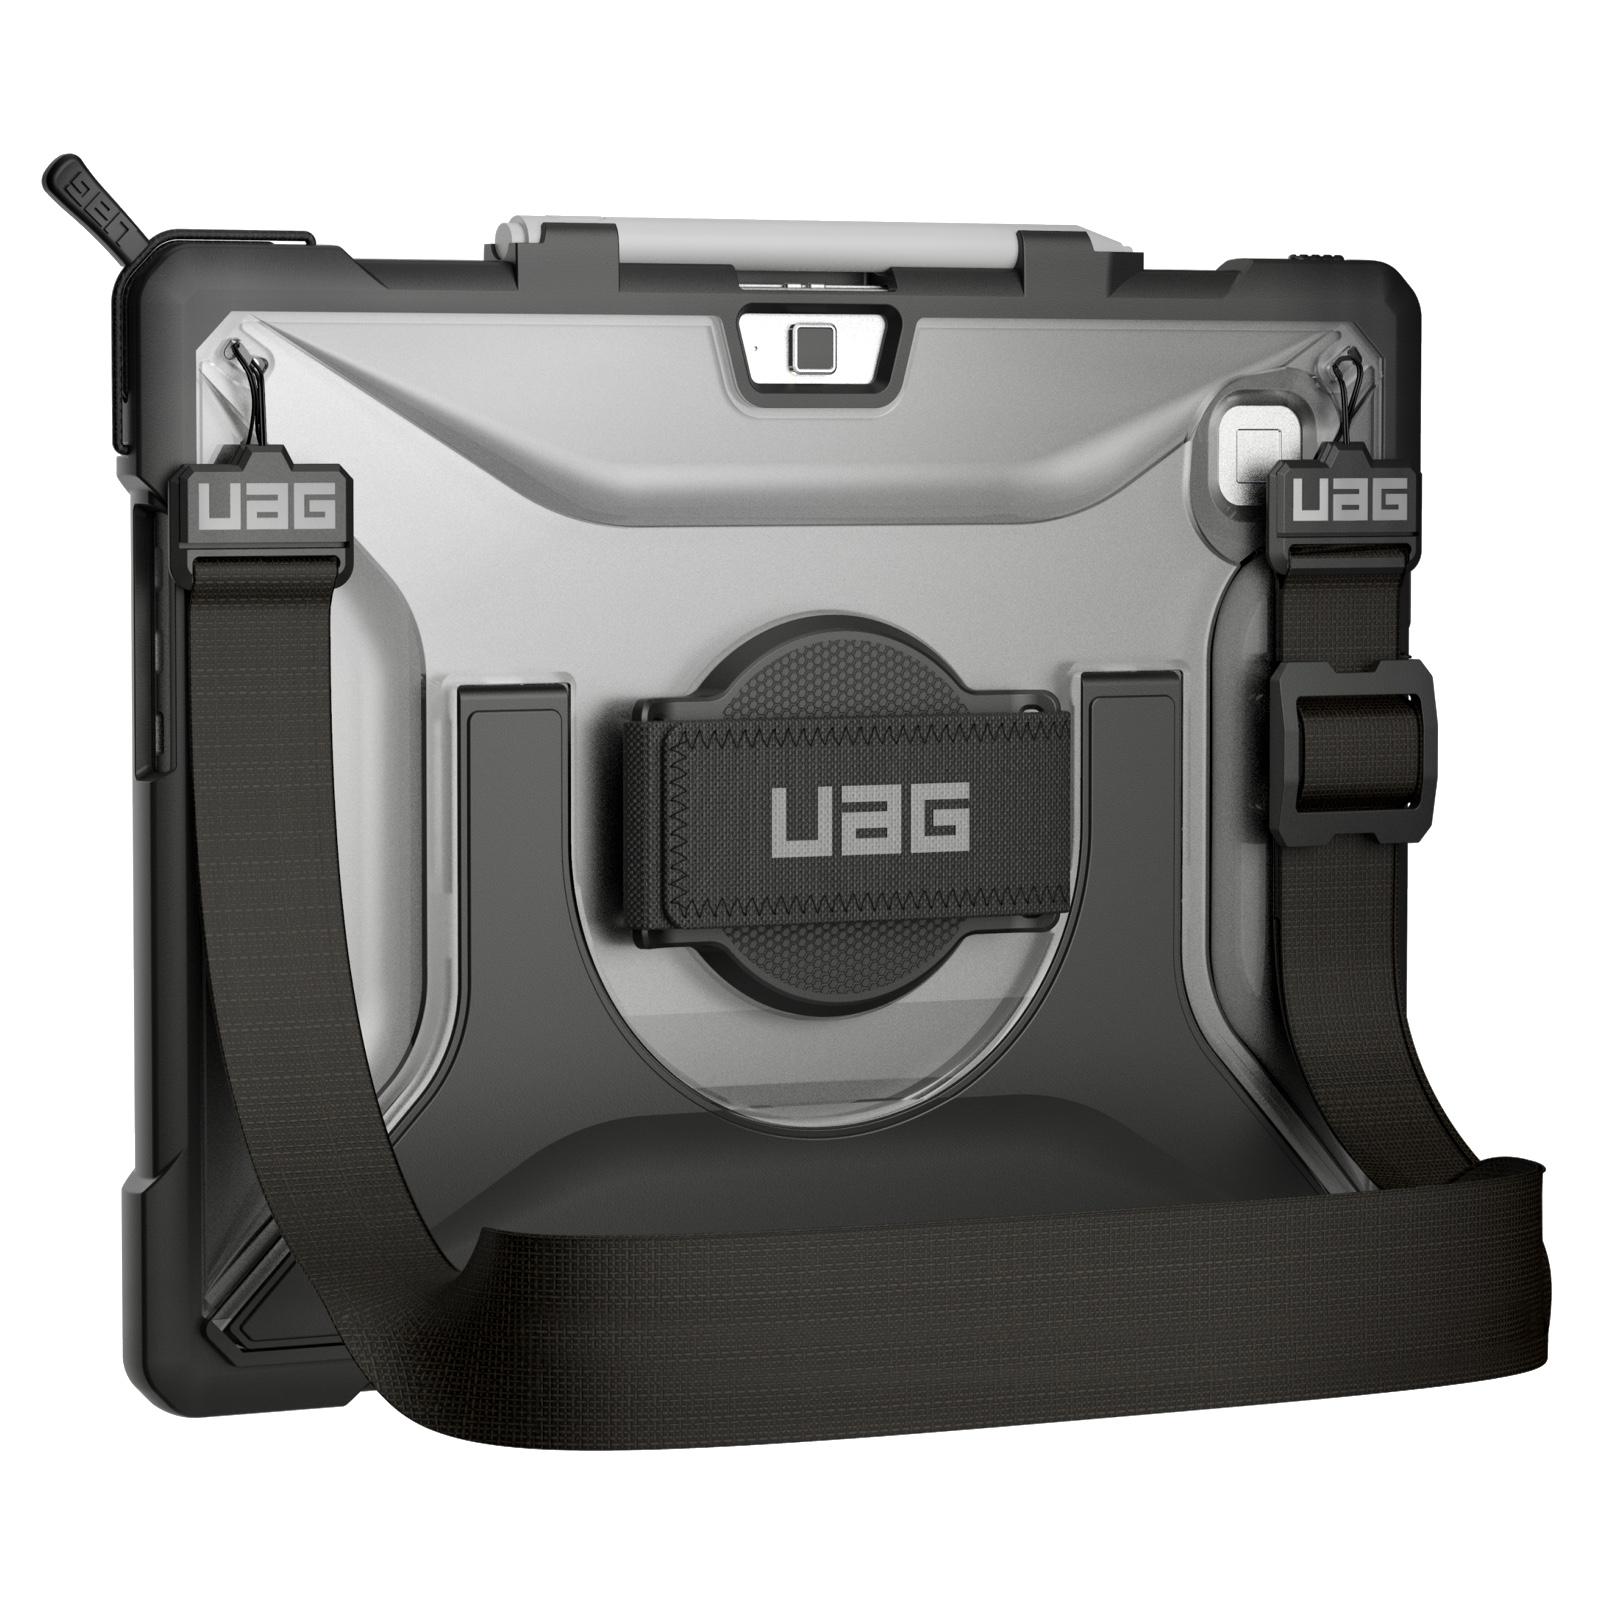 Hewlett Packard 13p Elite X2 G4 Coque renforcee Sangle main et epaule Security